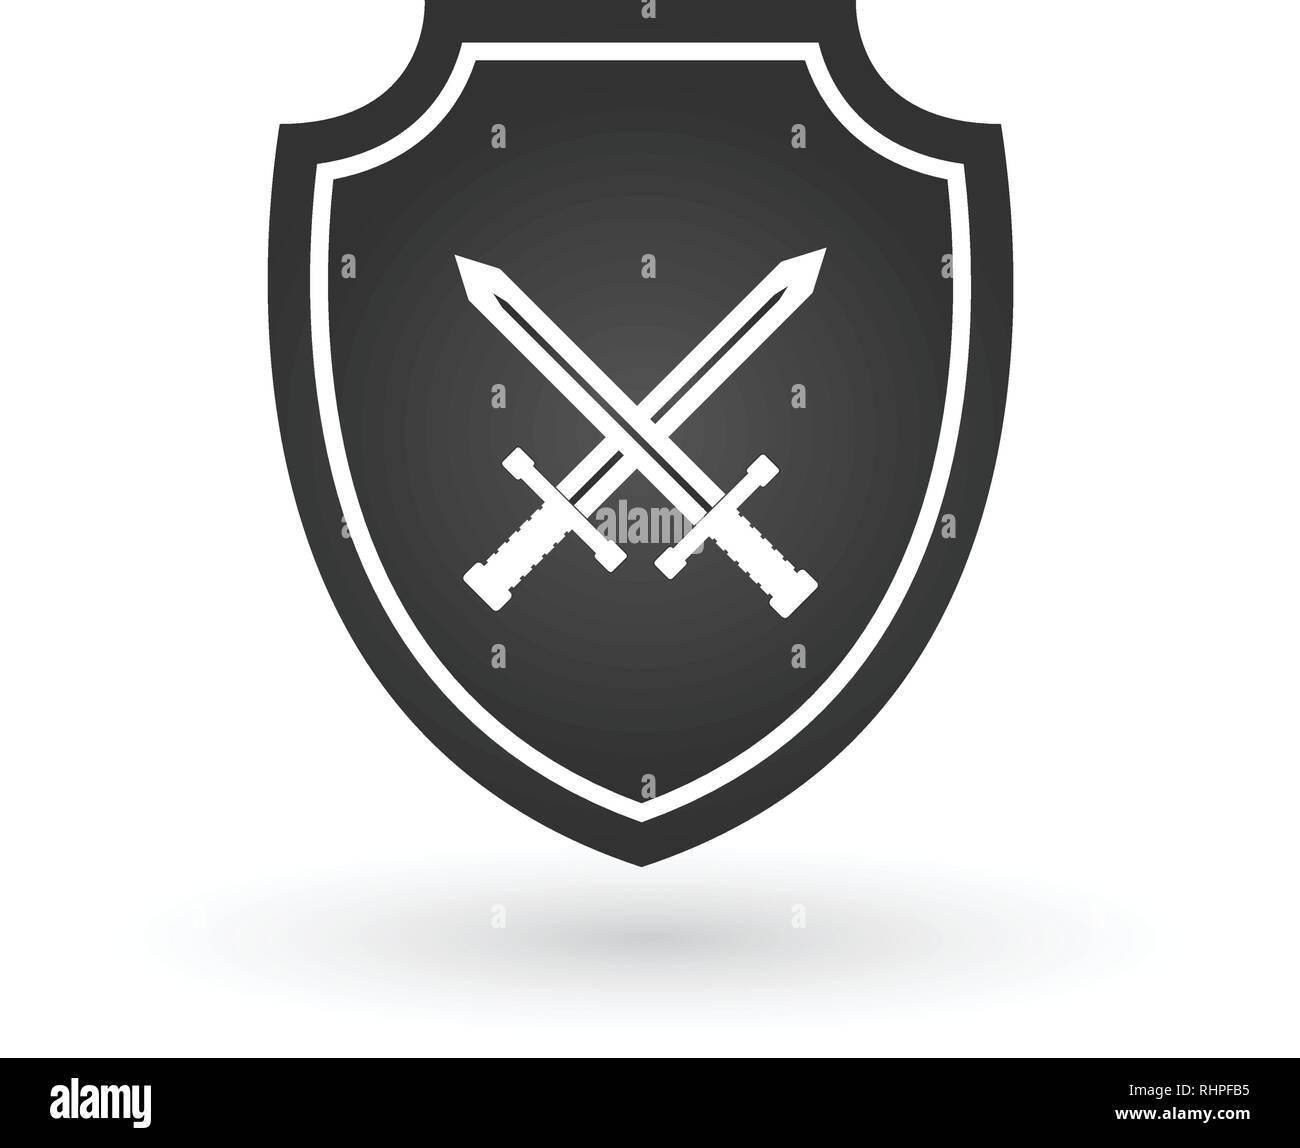 Crossed Swords Logo Stock Photos & Crossed Swords Logo Stock